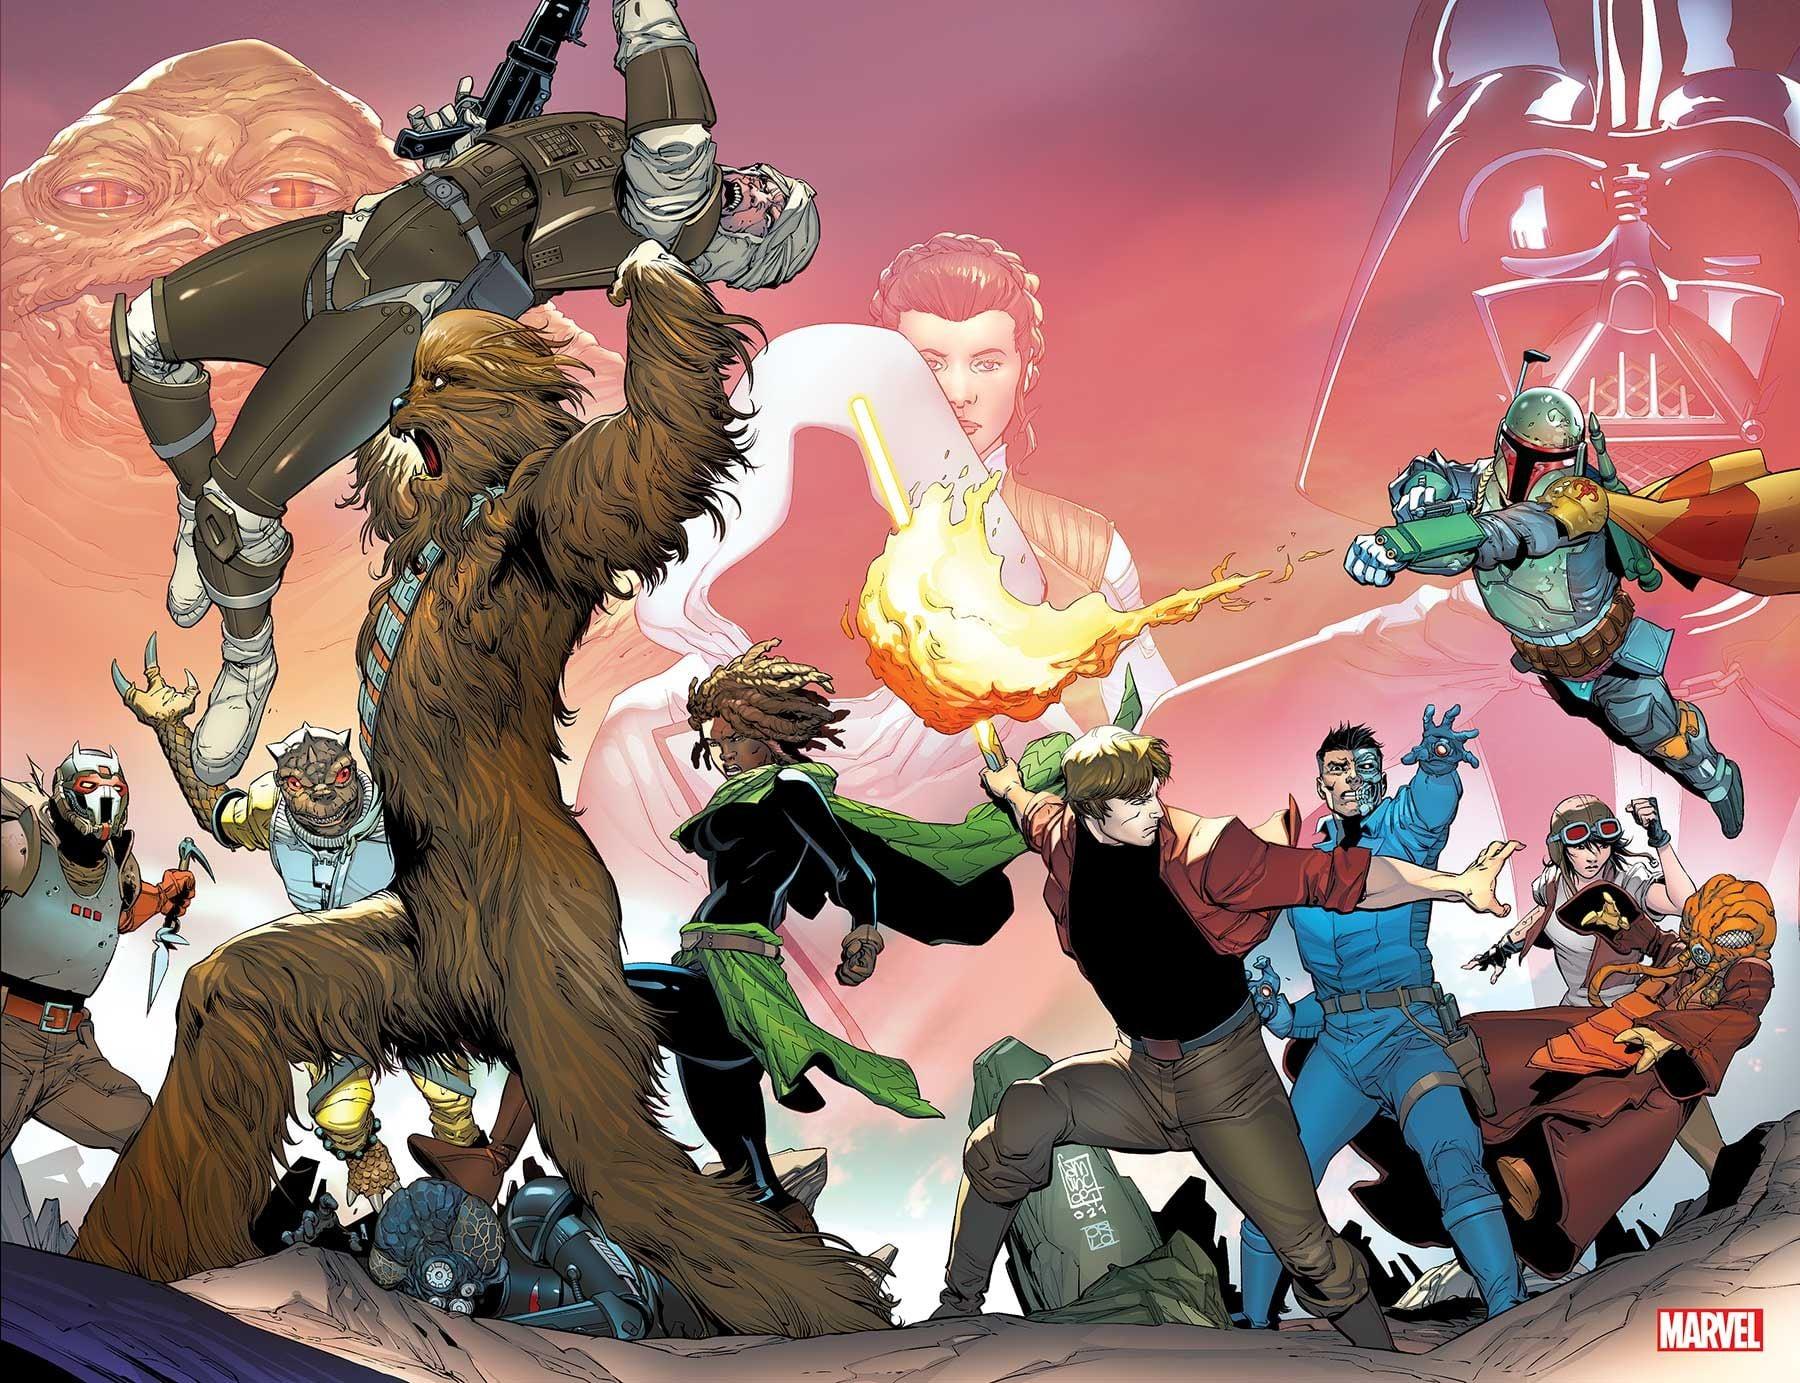 Star Wars: War of the Bounty Hunters 1 - Camuncoli Variant